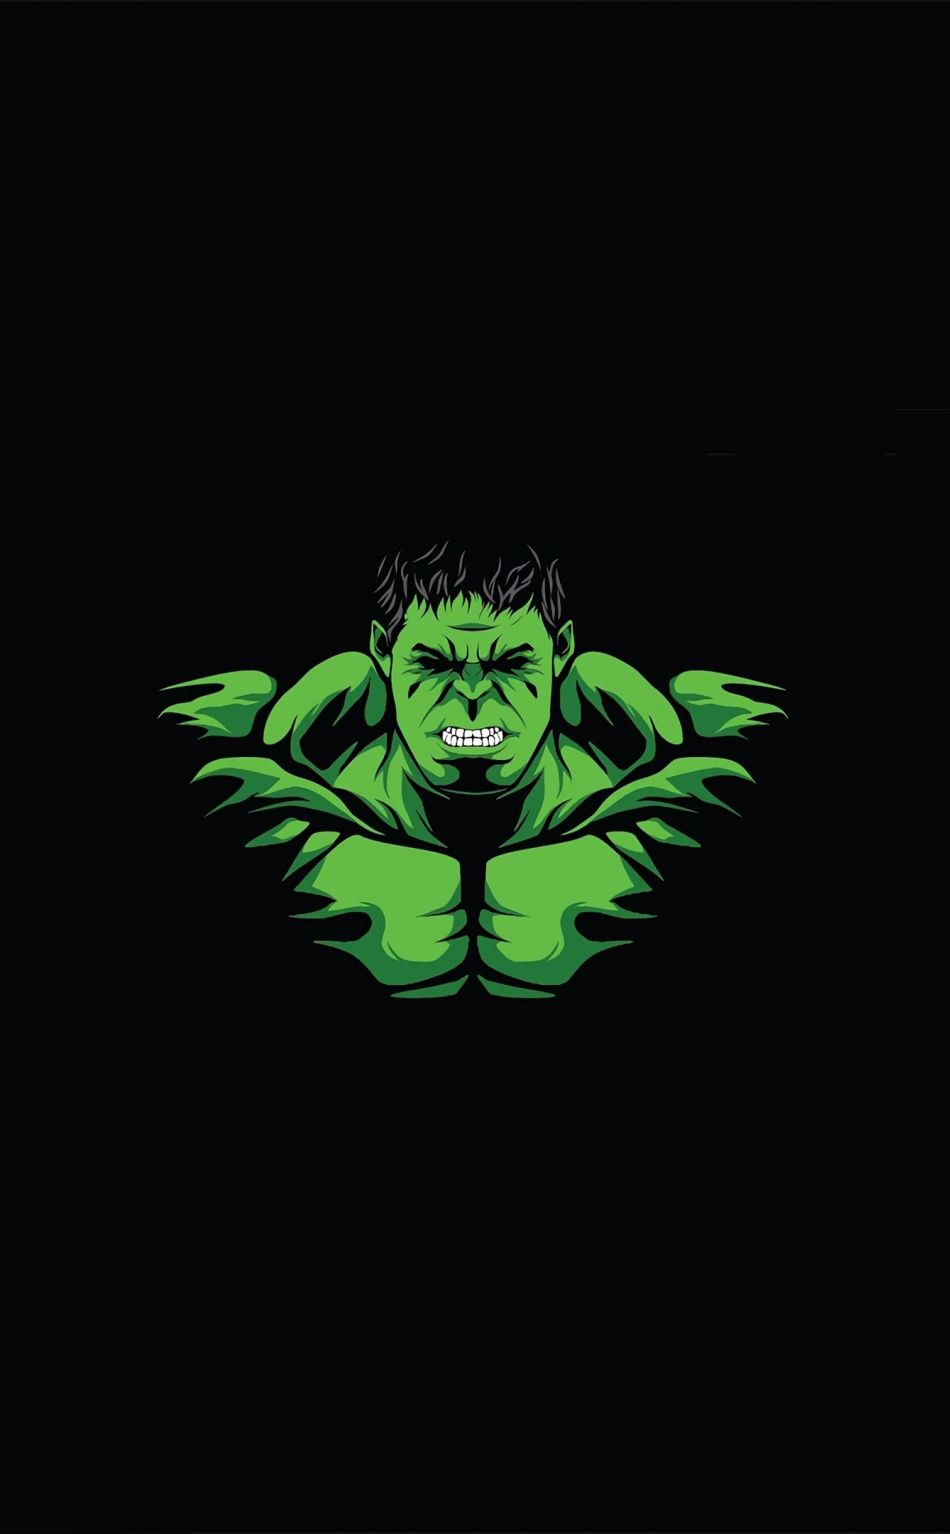 950x1534 Hulk Angry Green Man Minimal Wallpaper Cartoon Wallpaper Hd Hulk Art Cartoon Wallpaper